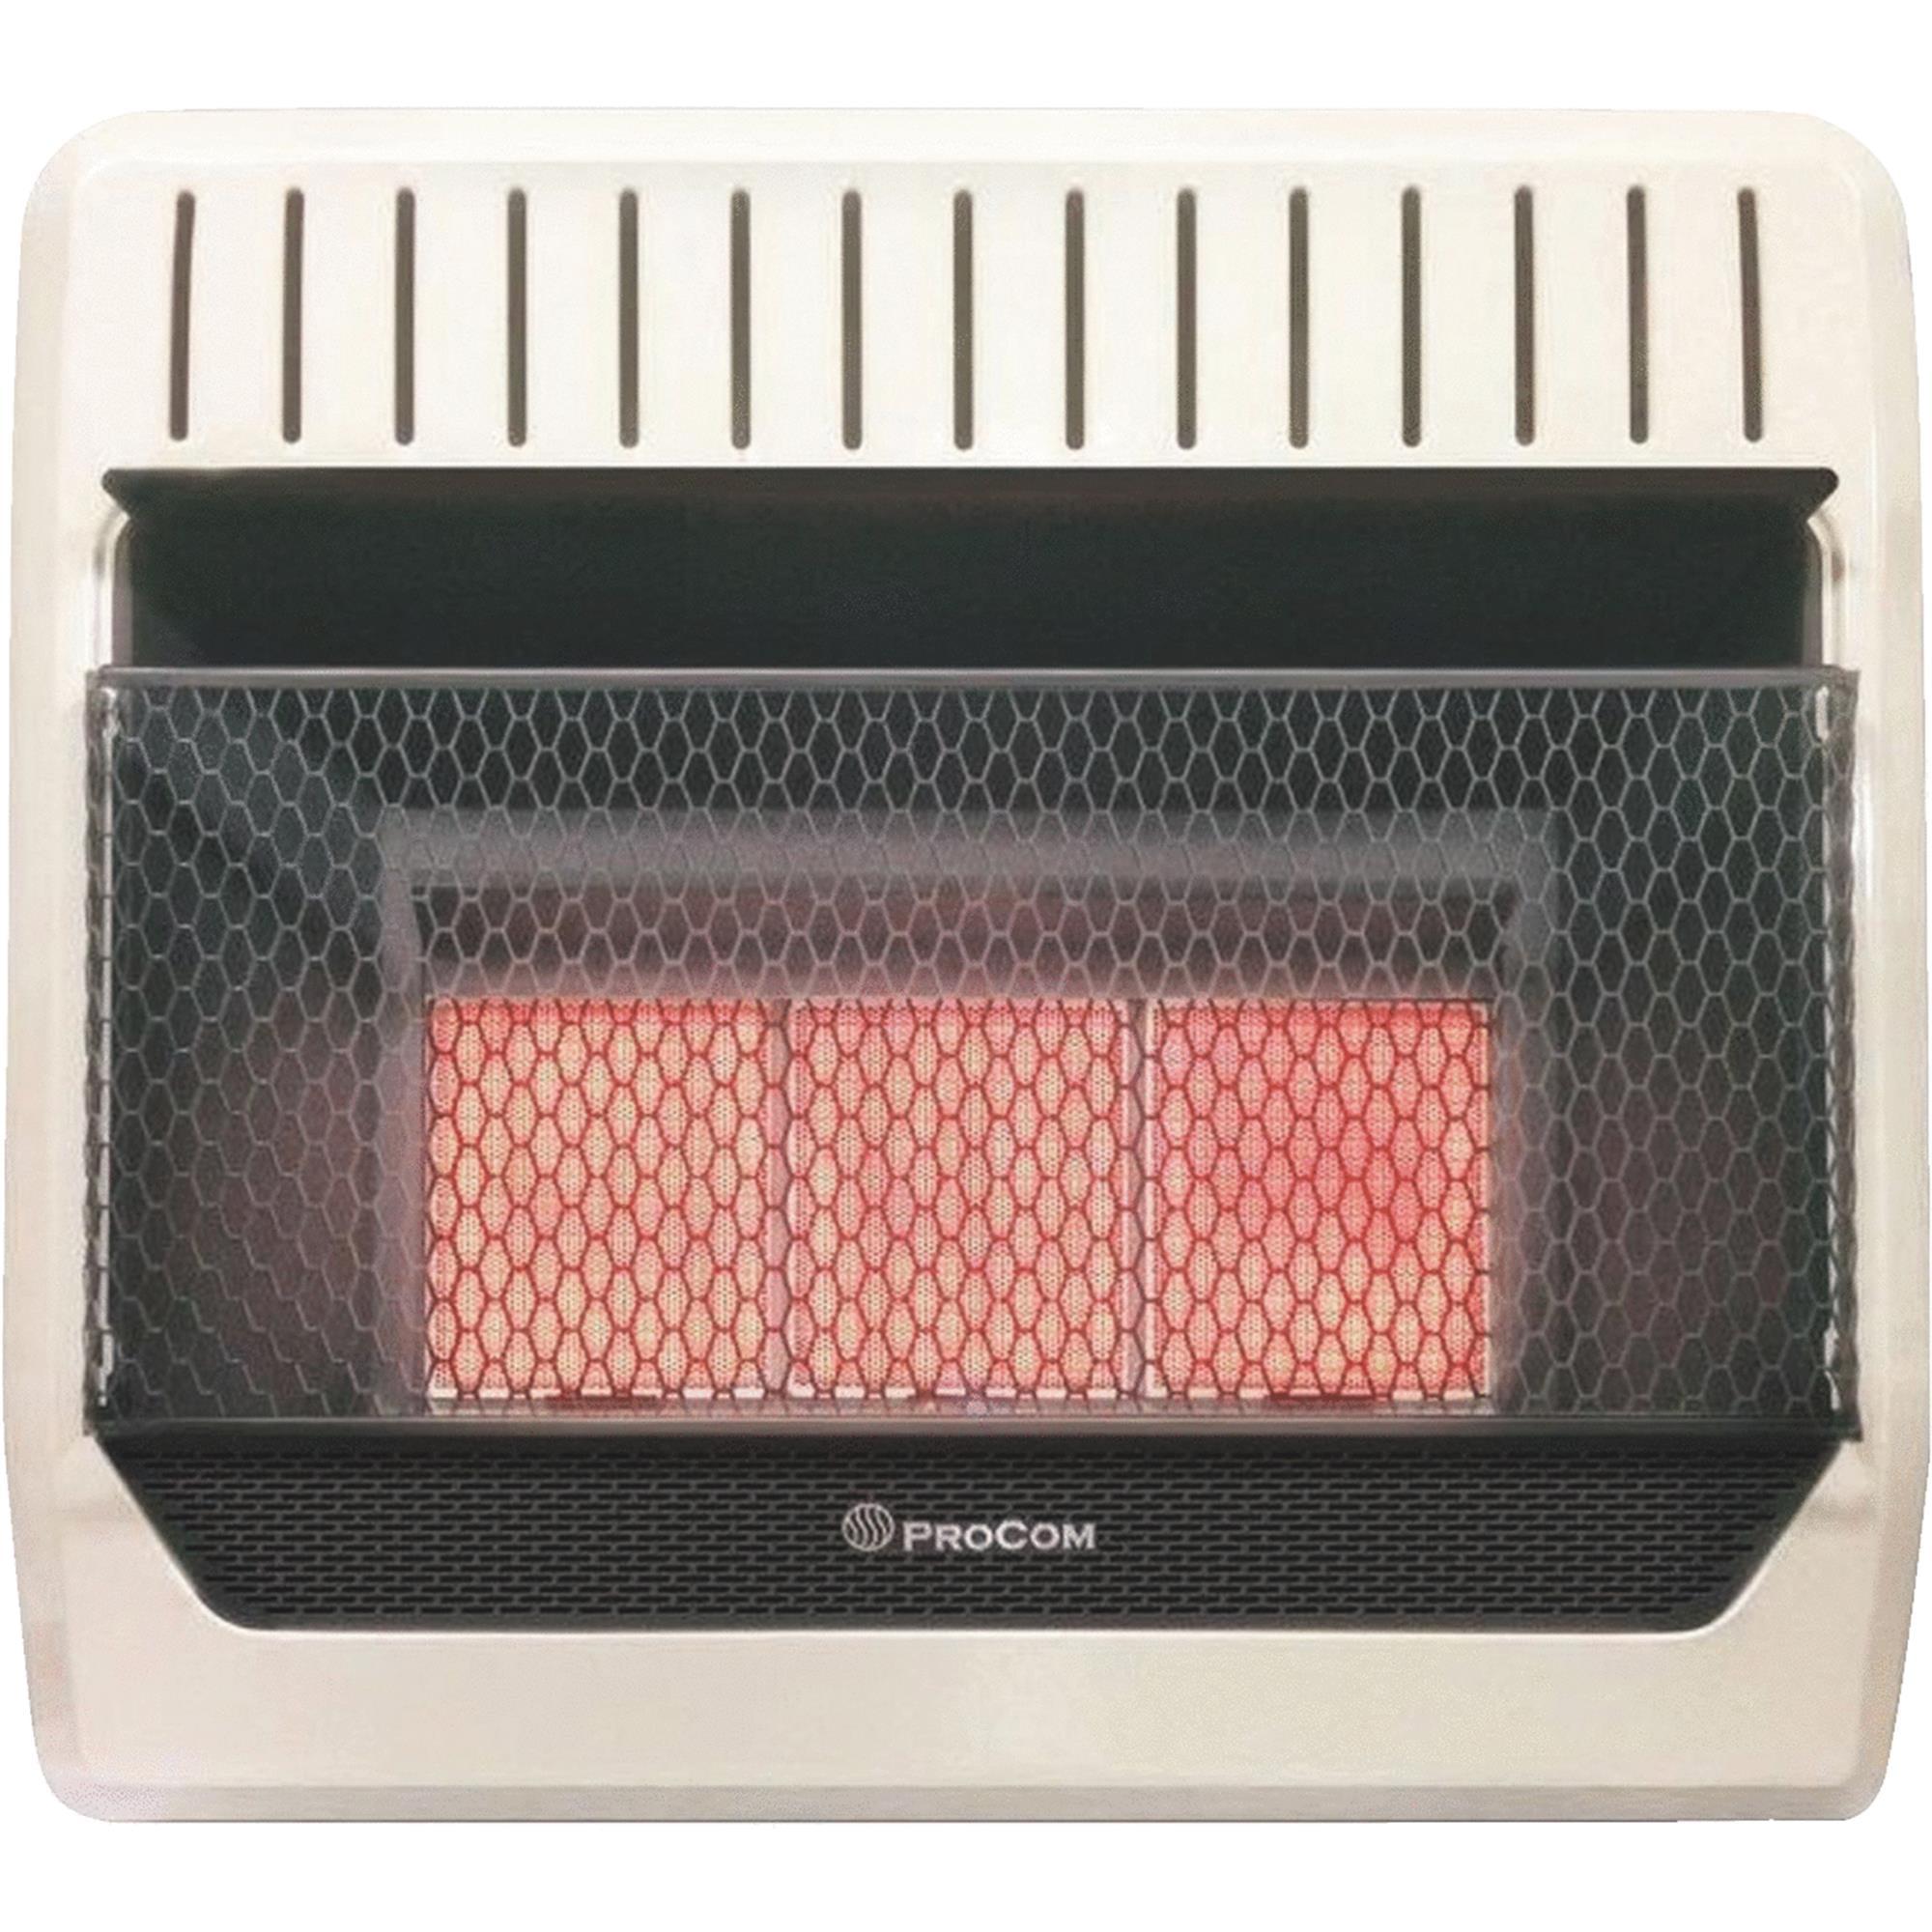 PROCOM HEATING INC Infrared Wall Heater, Dual Fuel, Vent-Free, 28,000-BTU MG3T1R